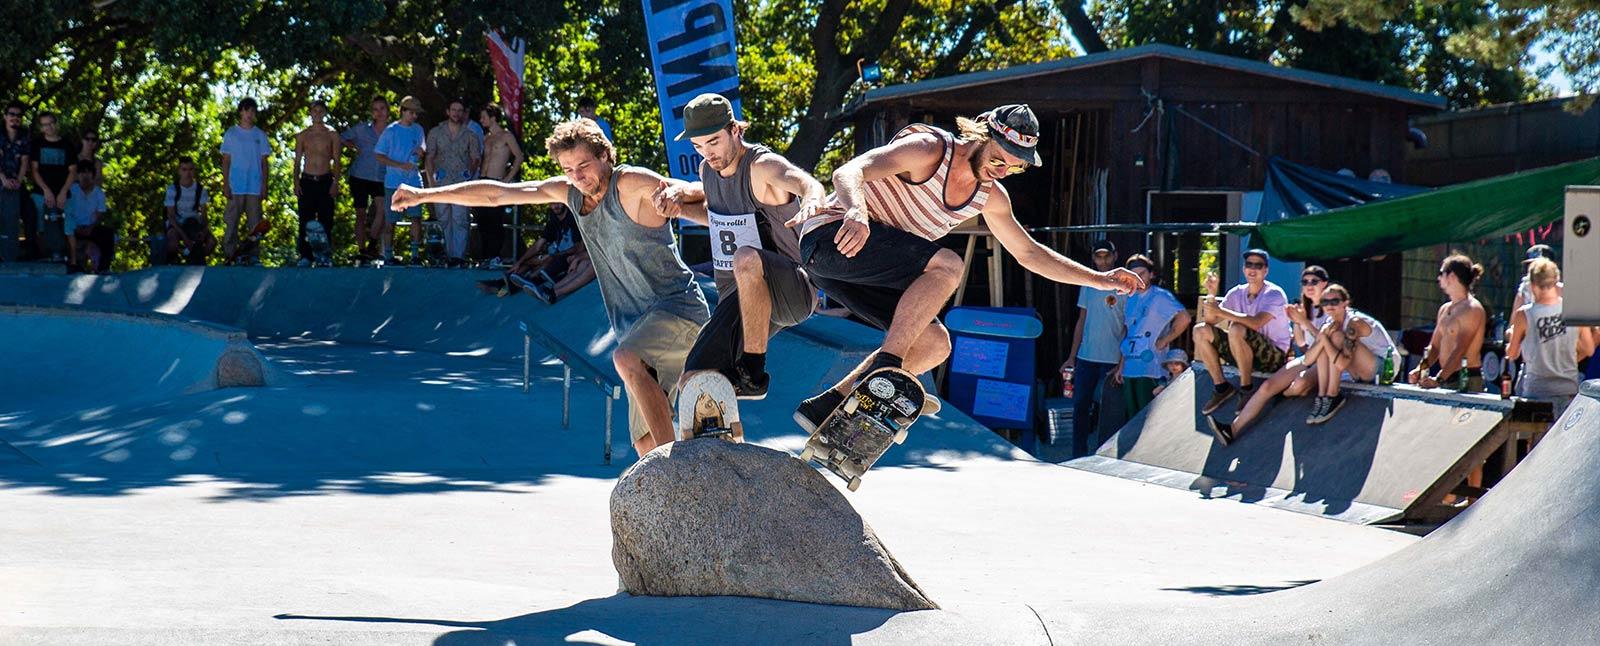 slider_start_ruegen_skateboarden_18_01